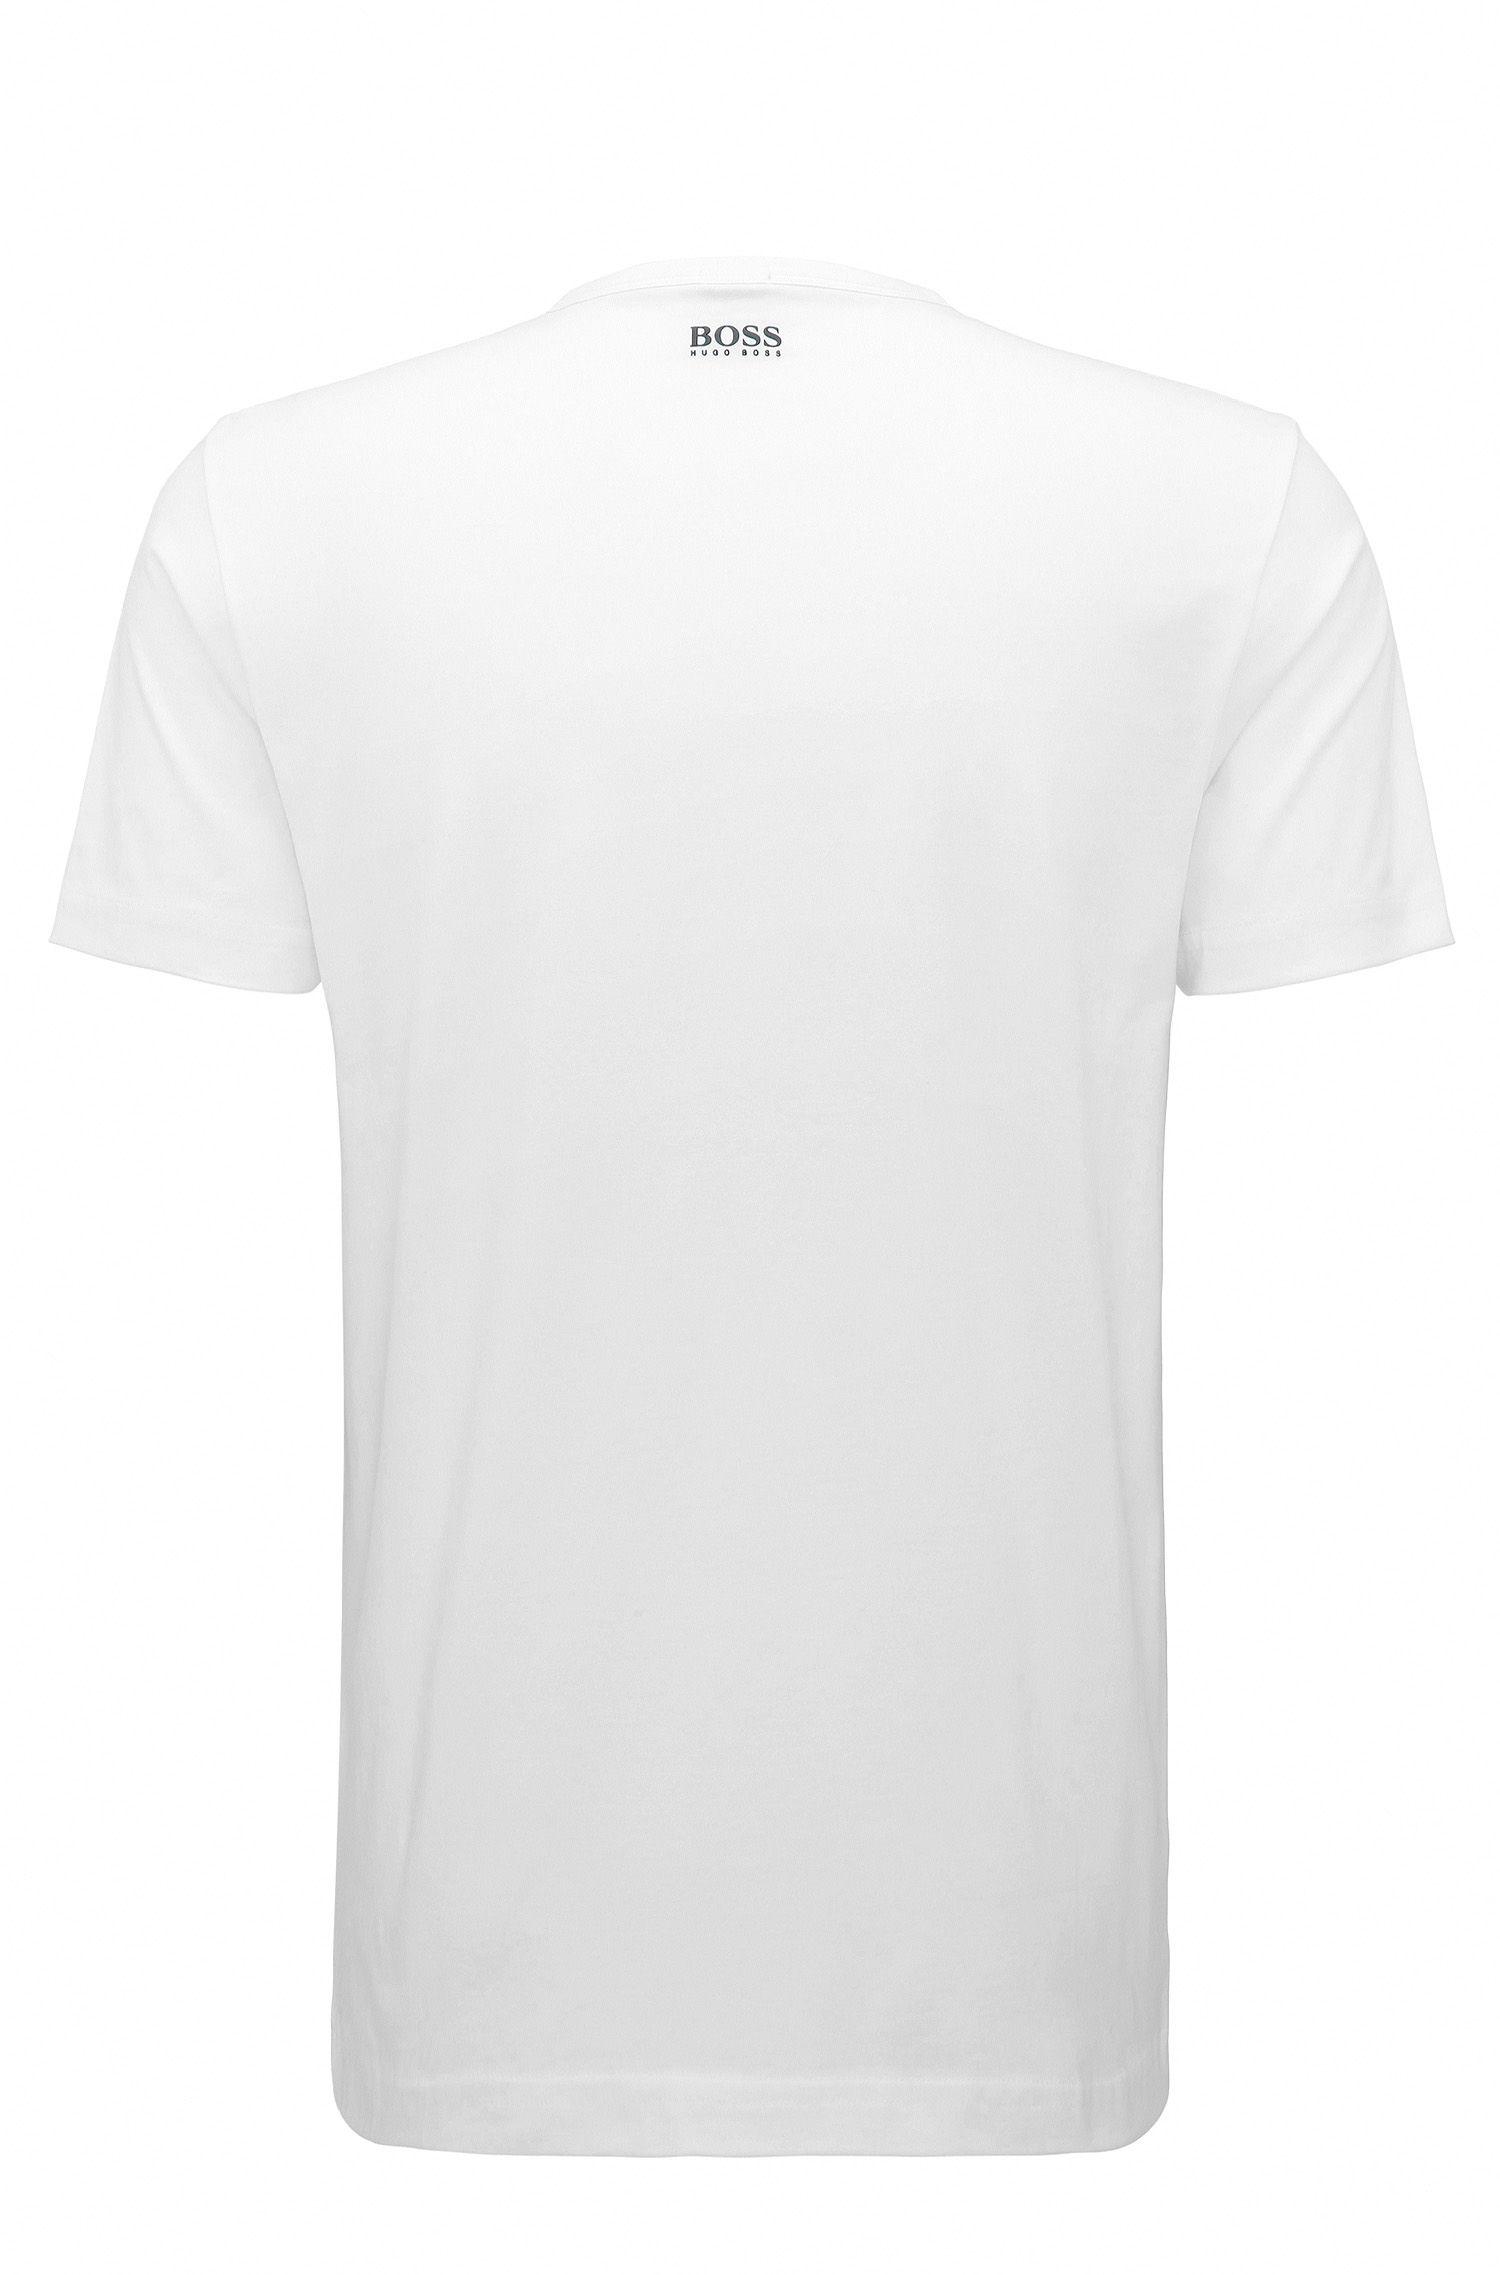 Logo-Print Stretch Cotton Graphic T-Shirt | Tee, White